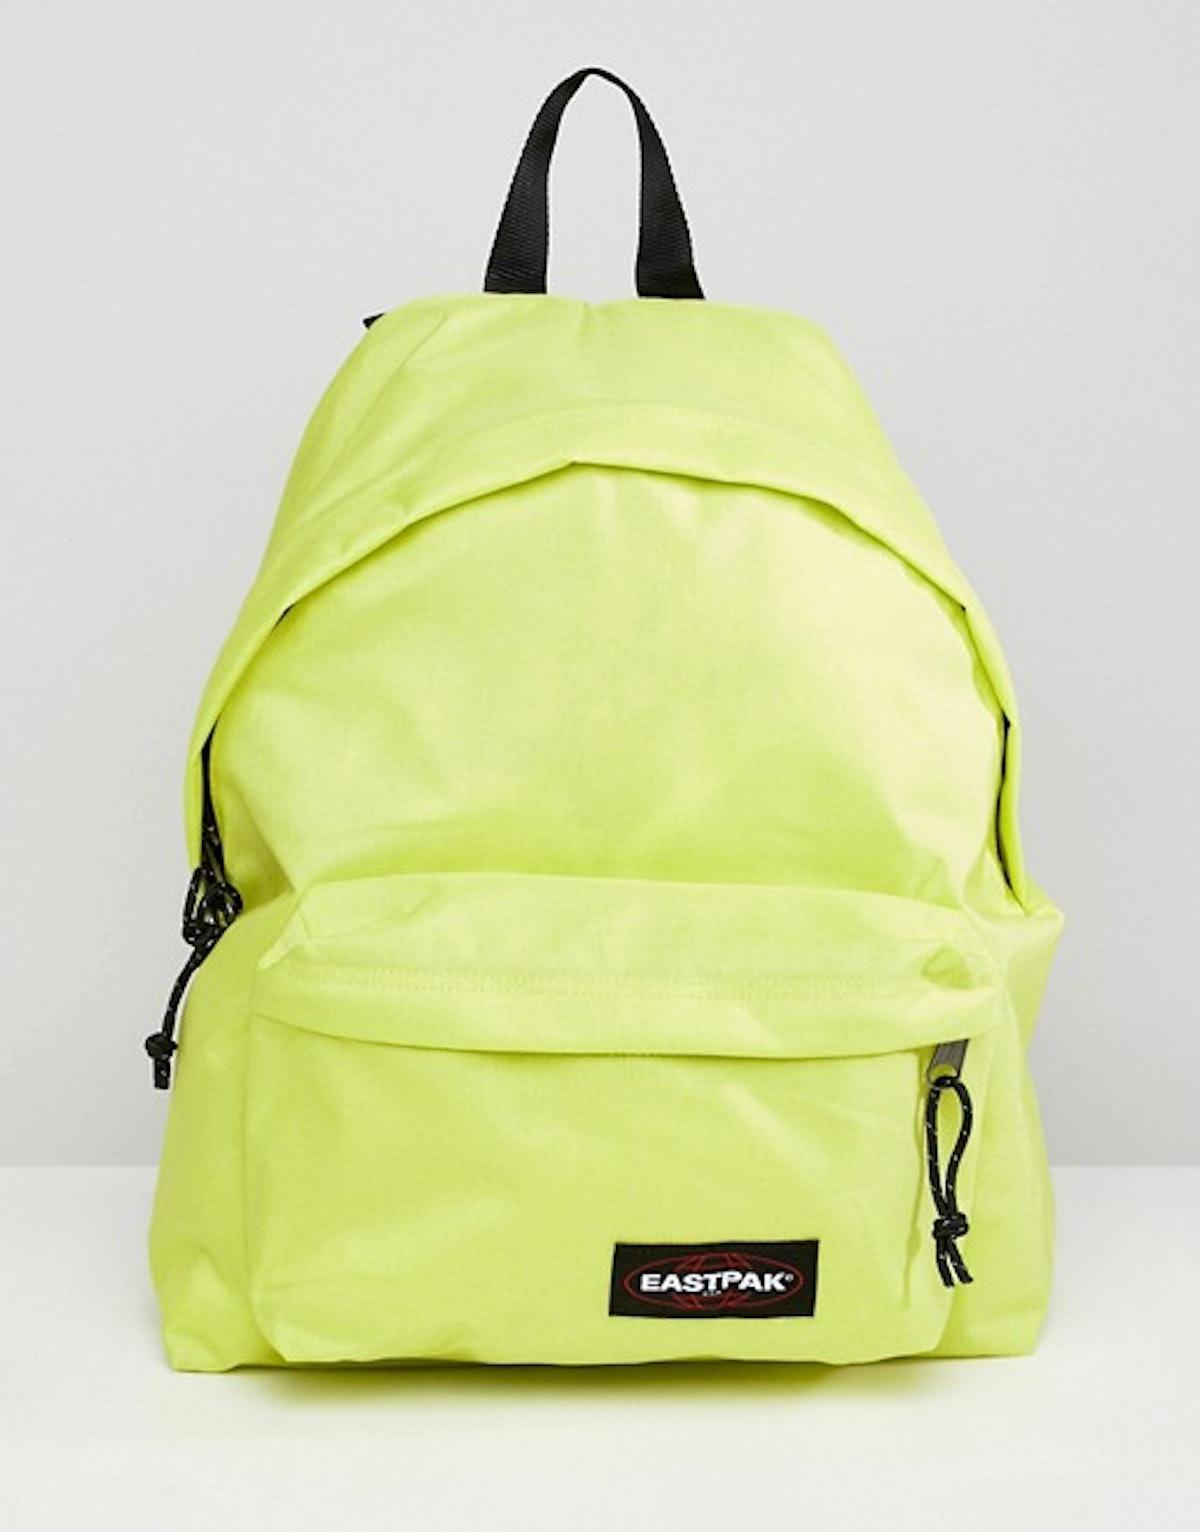 Eastpak Yellow Padded Pak'r Backpack